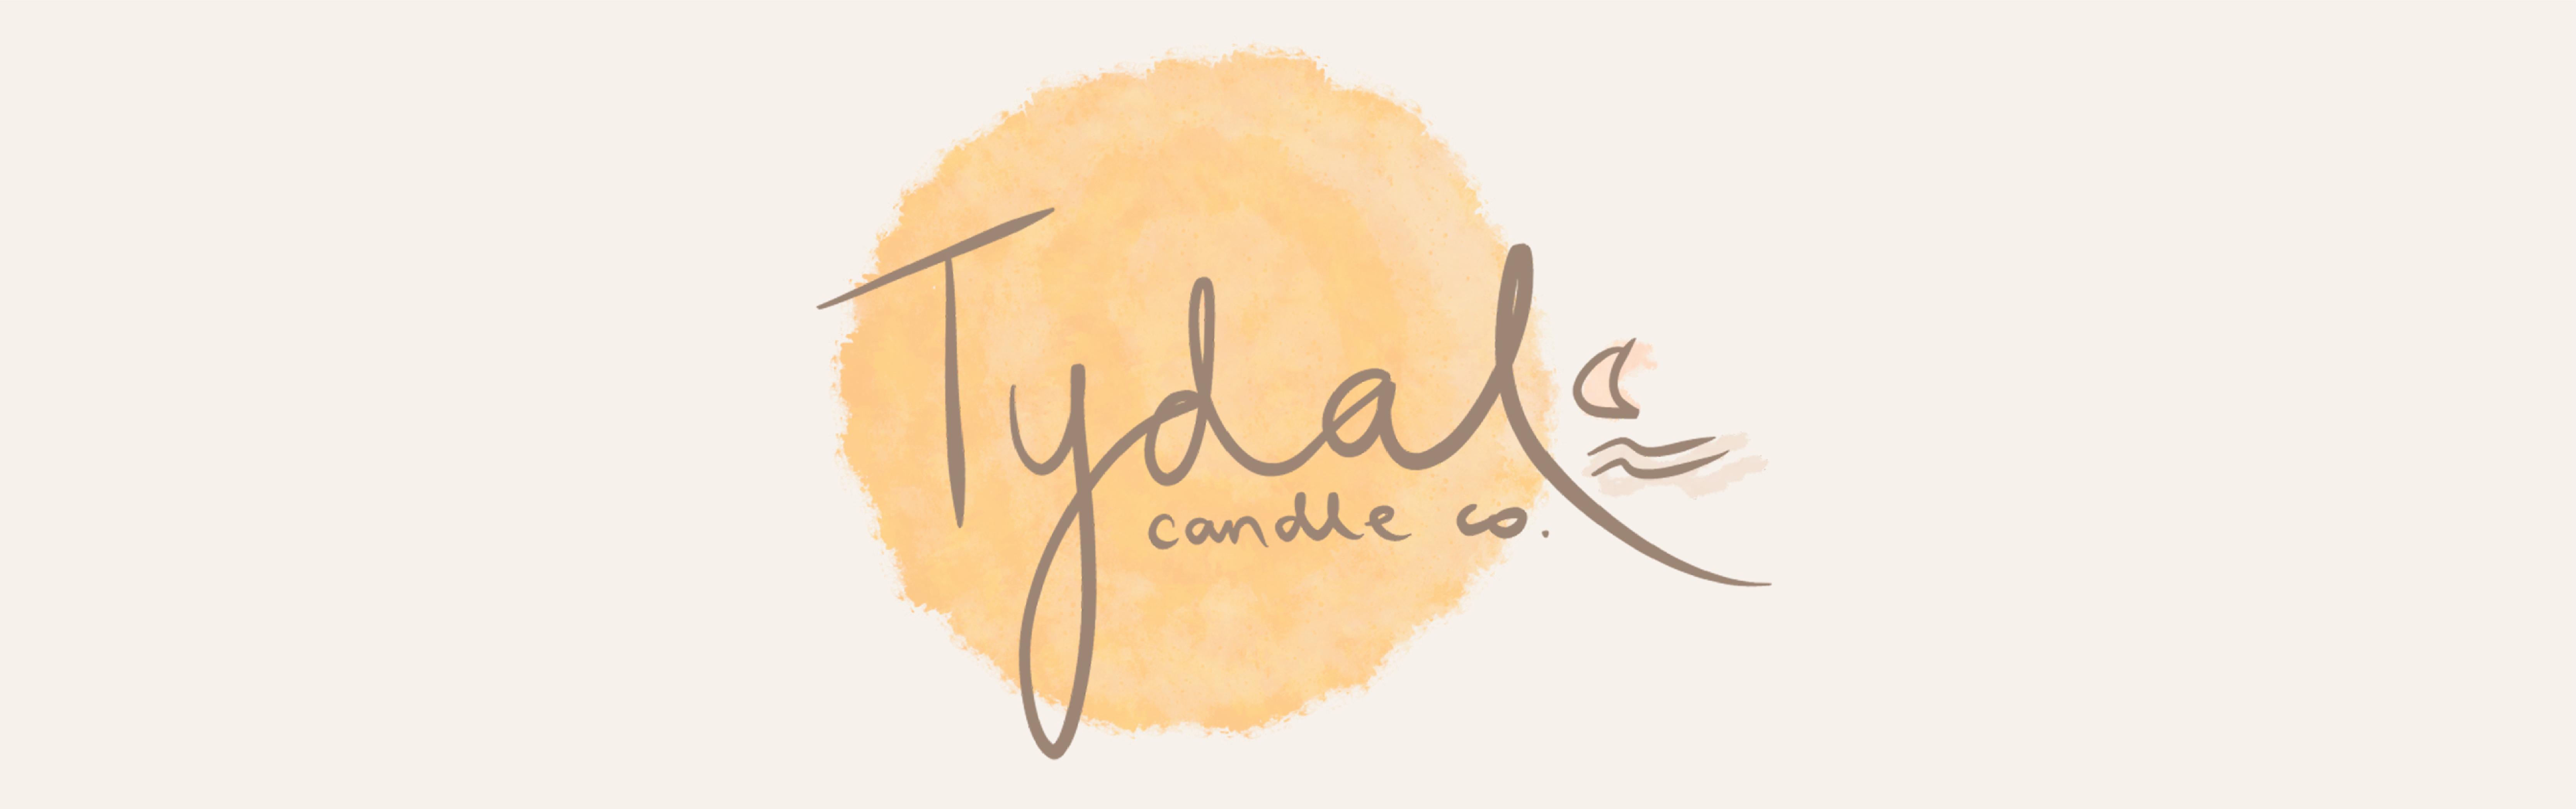 Tydal Candle Co.